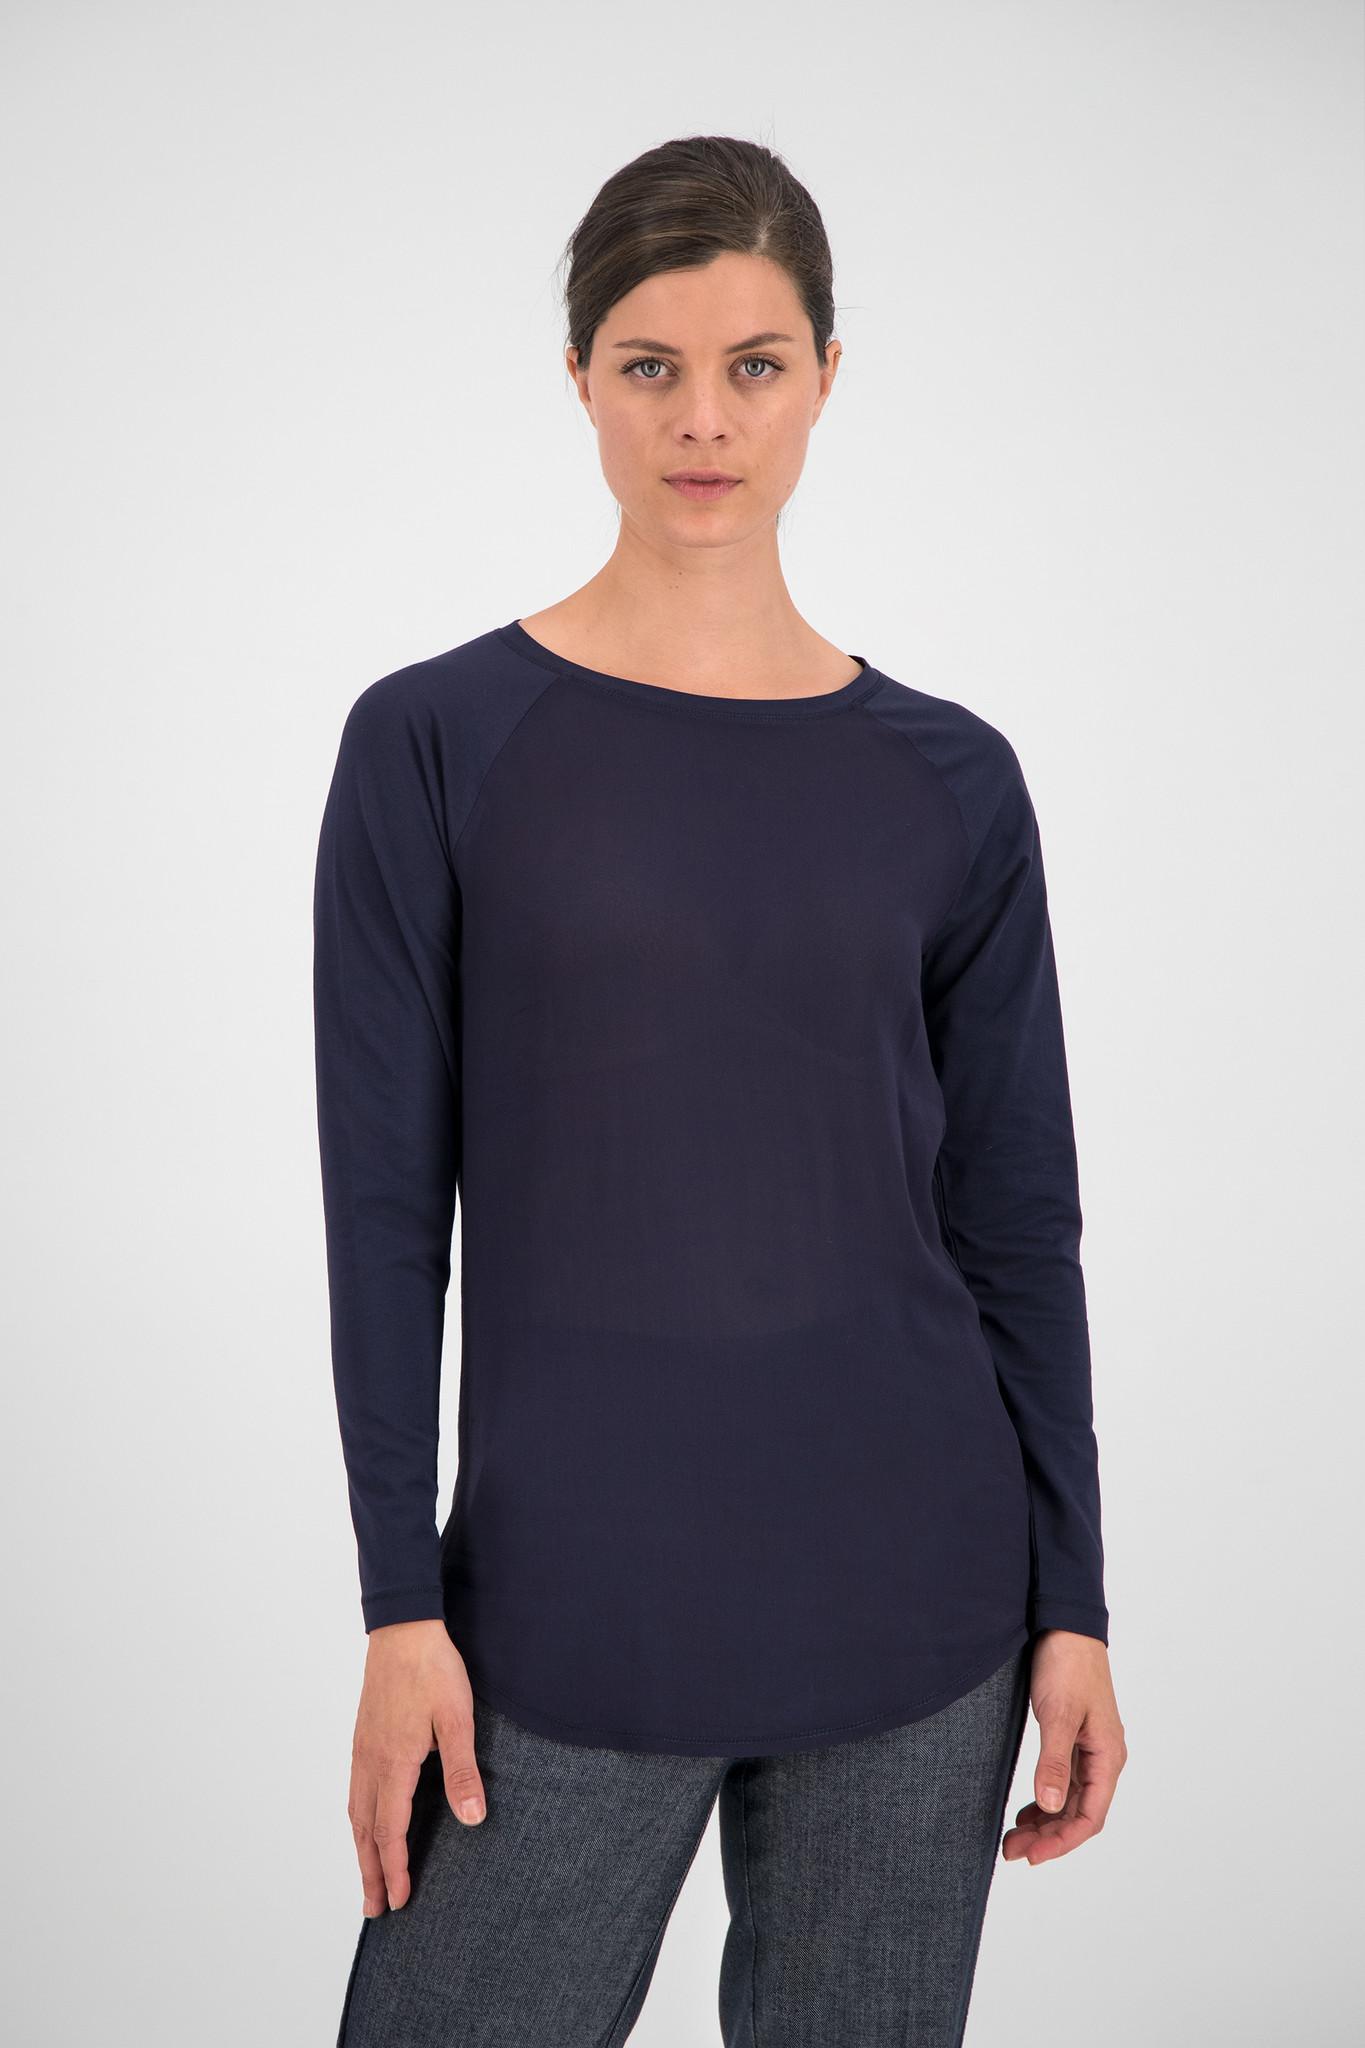 SYLVER Cotton Elastane Shirt Long Sleeve - Dark Blue